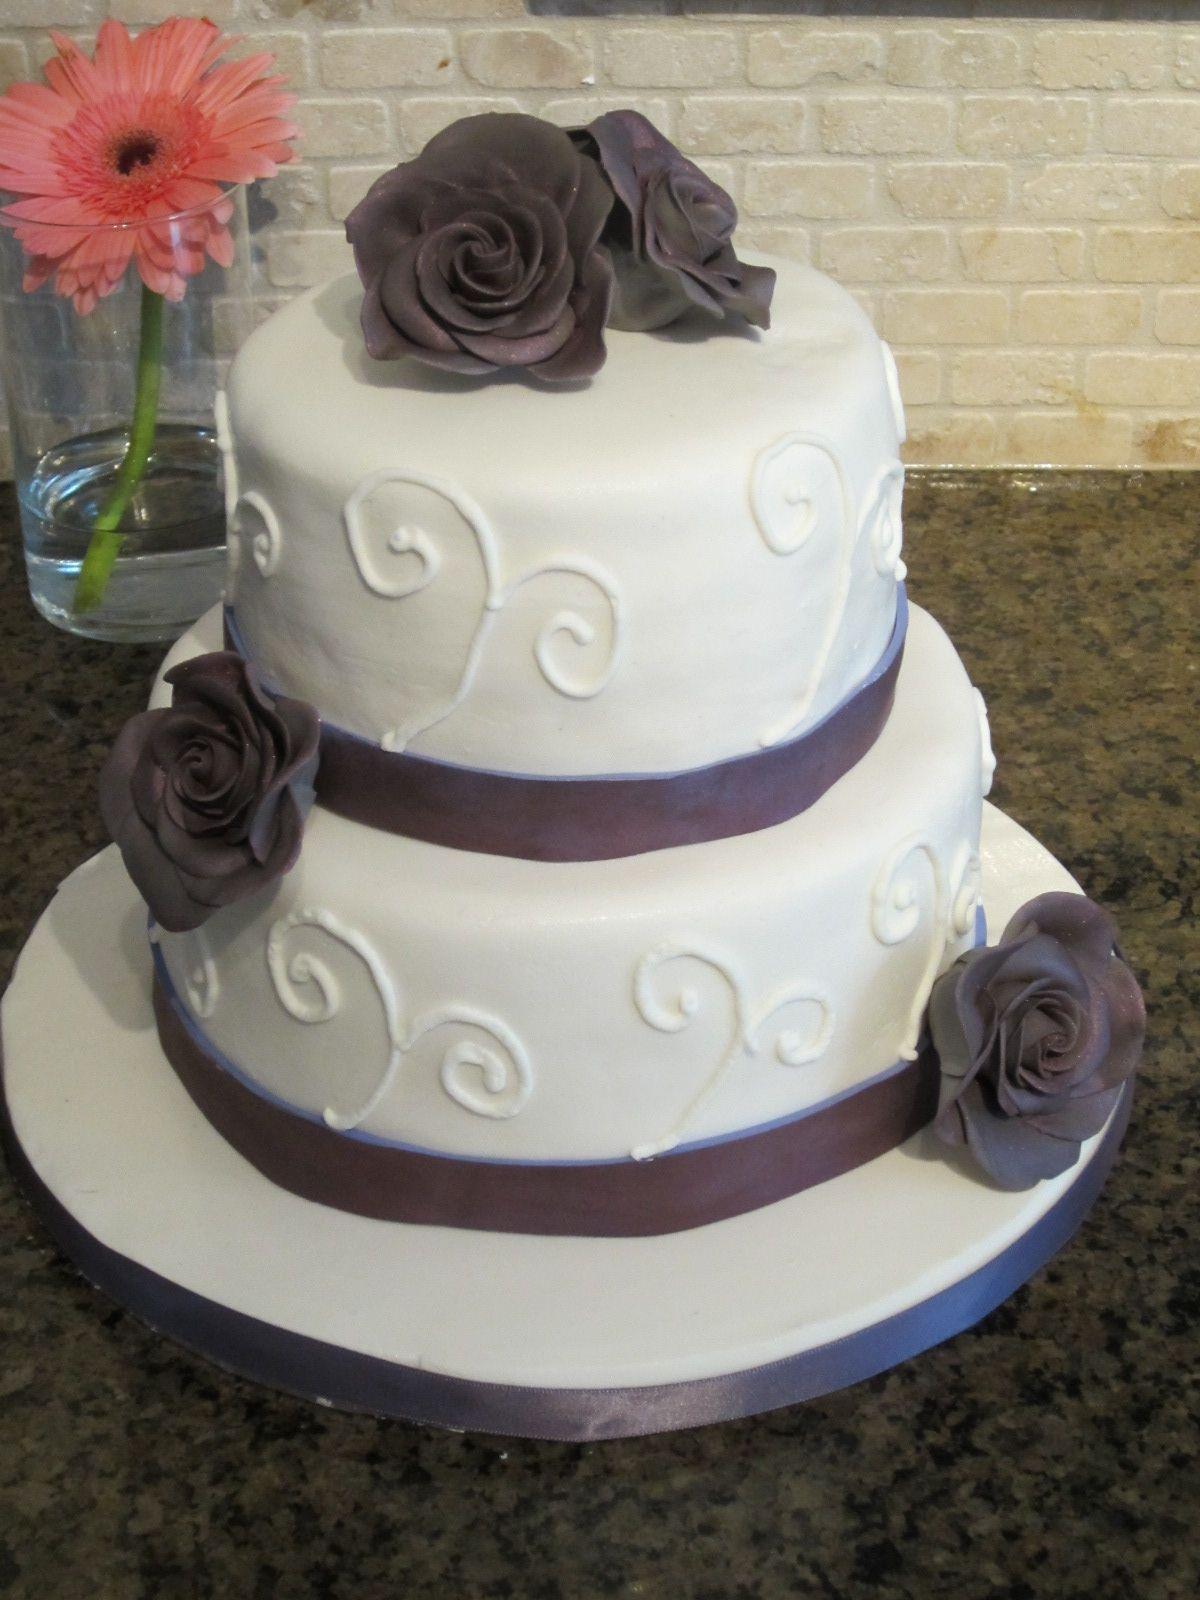 Small Wedding Cakes | Small Purple Rose Wedding Cake